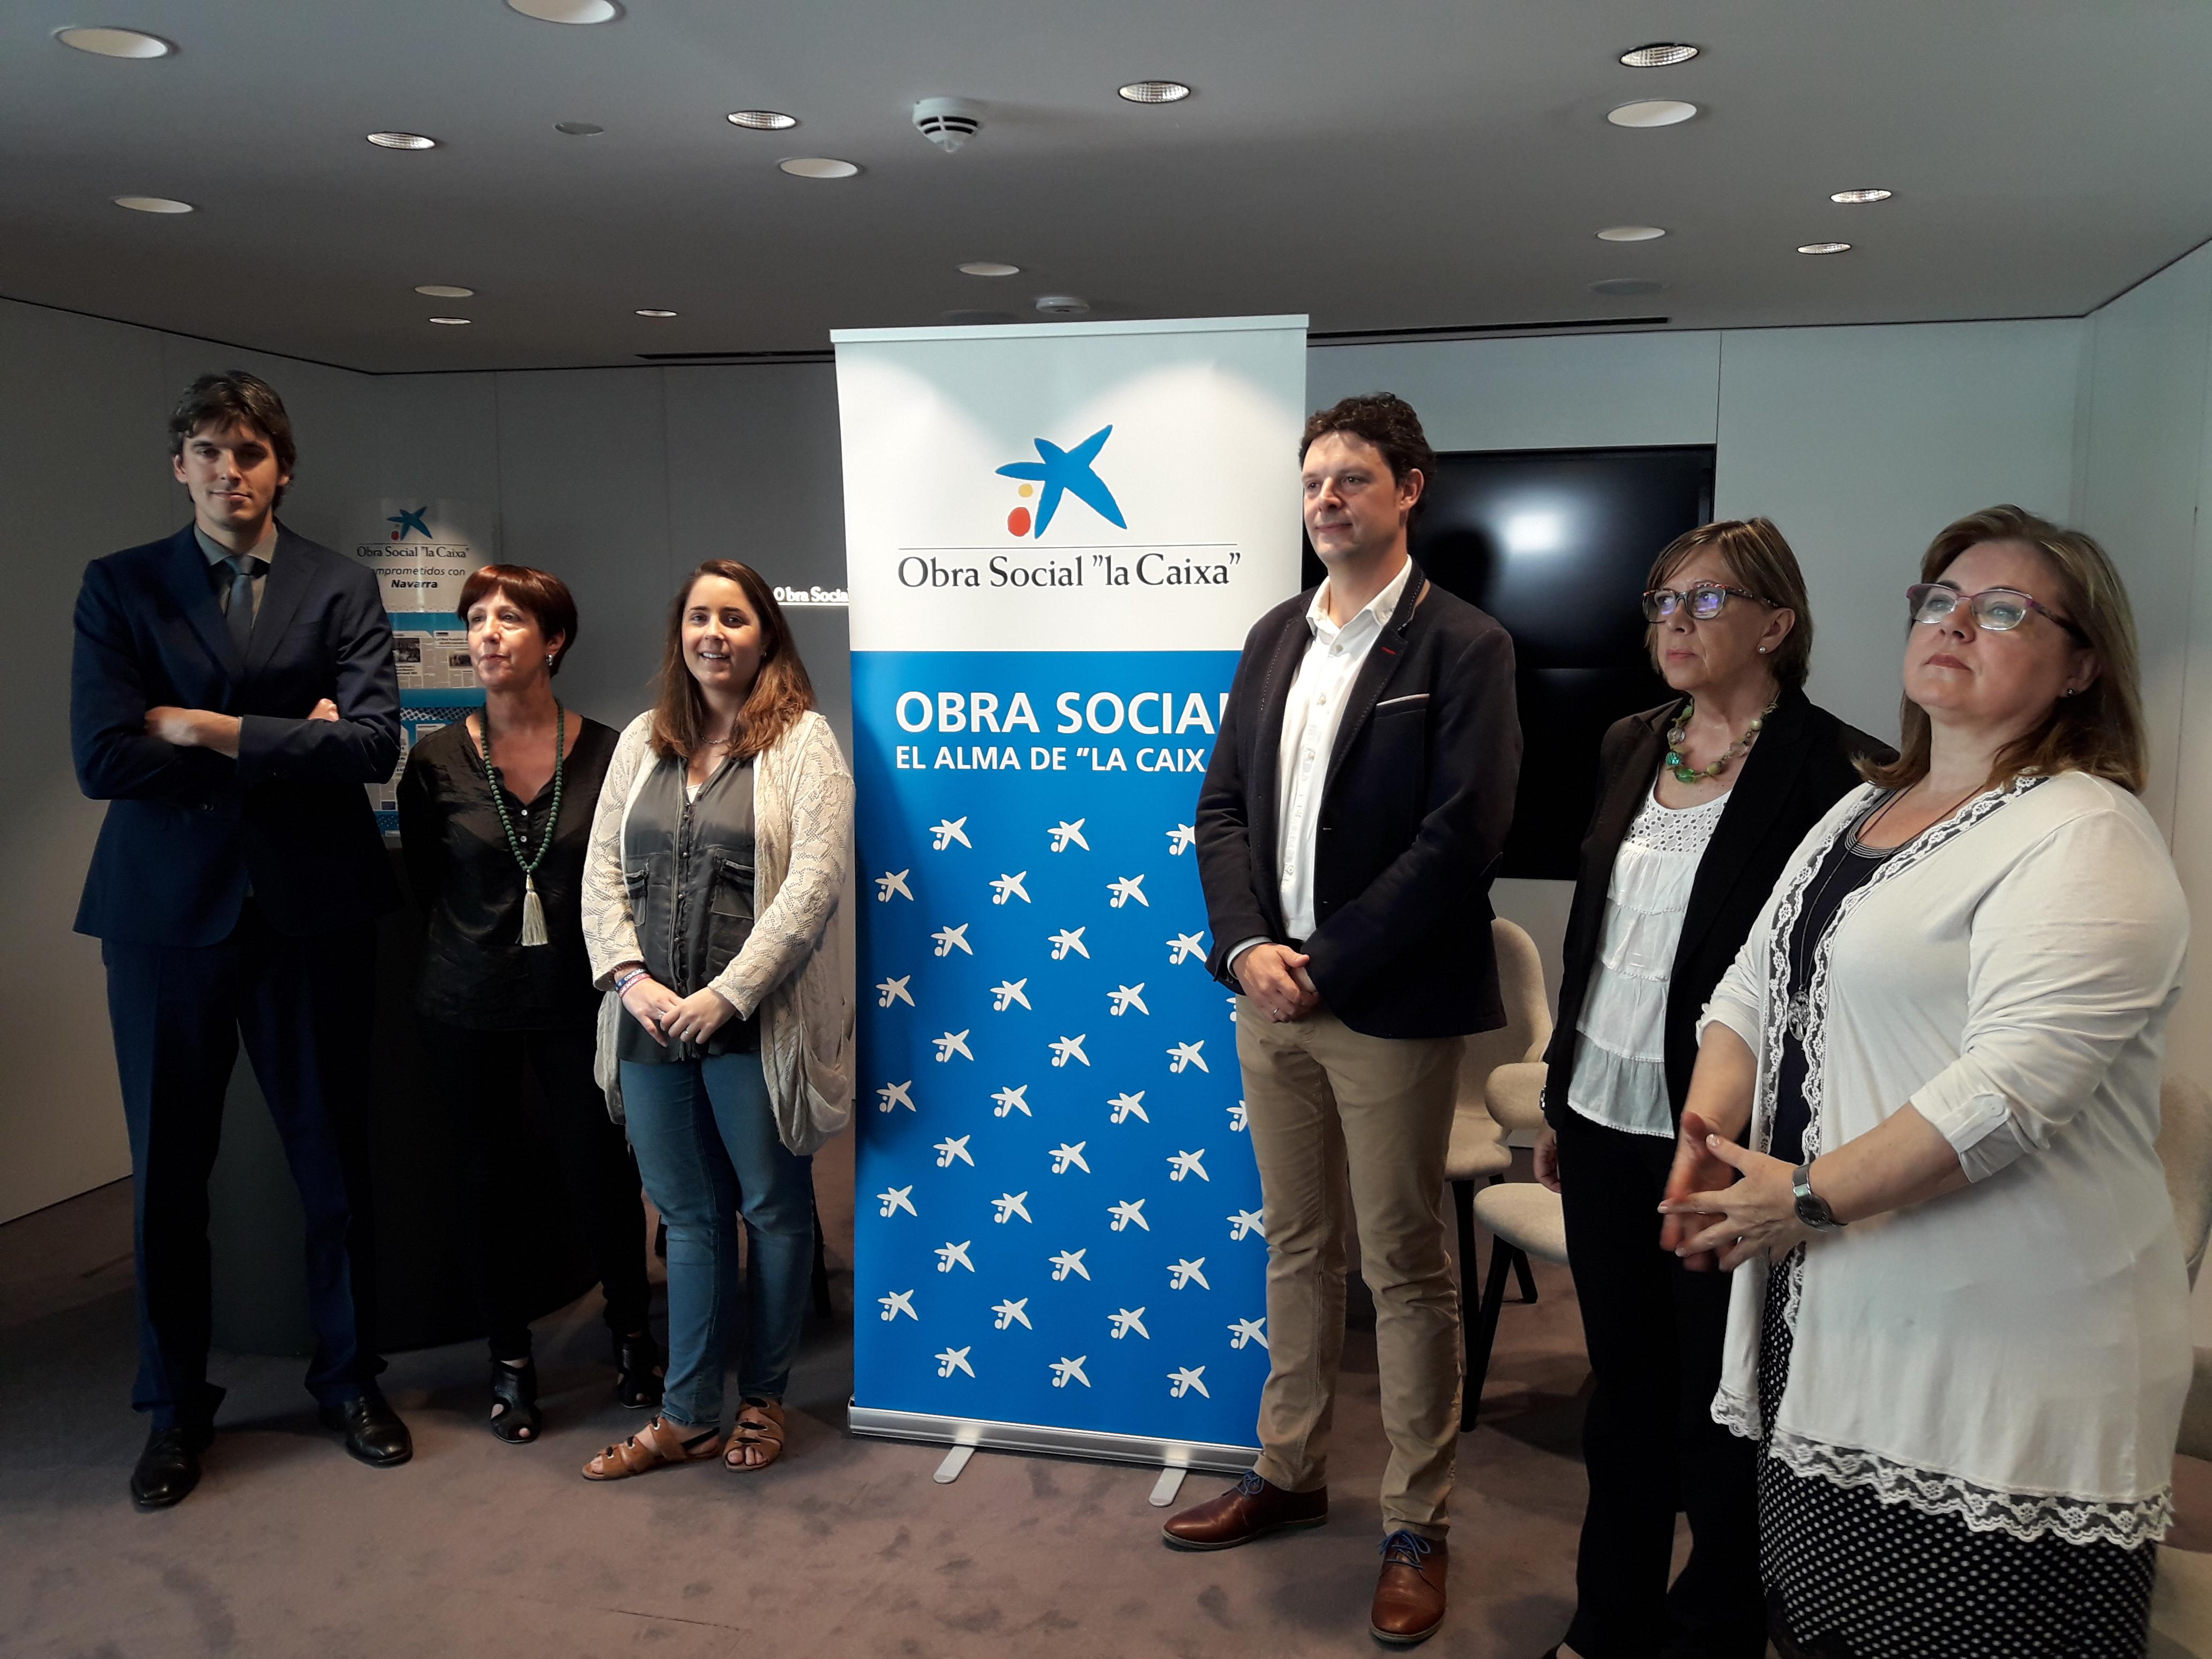 De I a D: Rubén Santamaría (Caixabank), Arantxa Garatea (Atena), Paula Rodríguez (ANA), Andrés Ilundáin (ADACEN), Inma Zabalza (Retina) y Cristina Jiménez (Profesionales Solidarios).